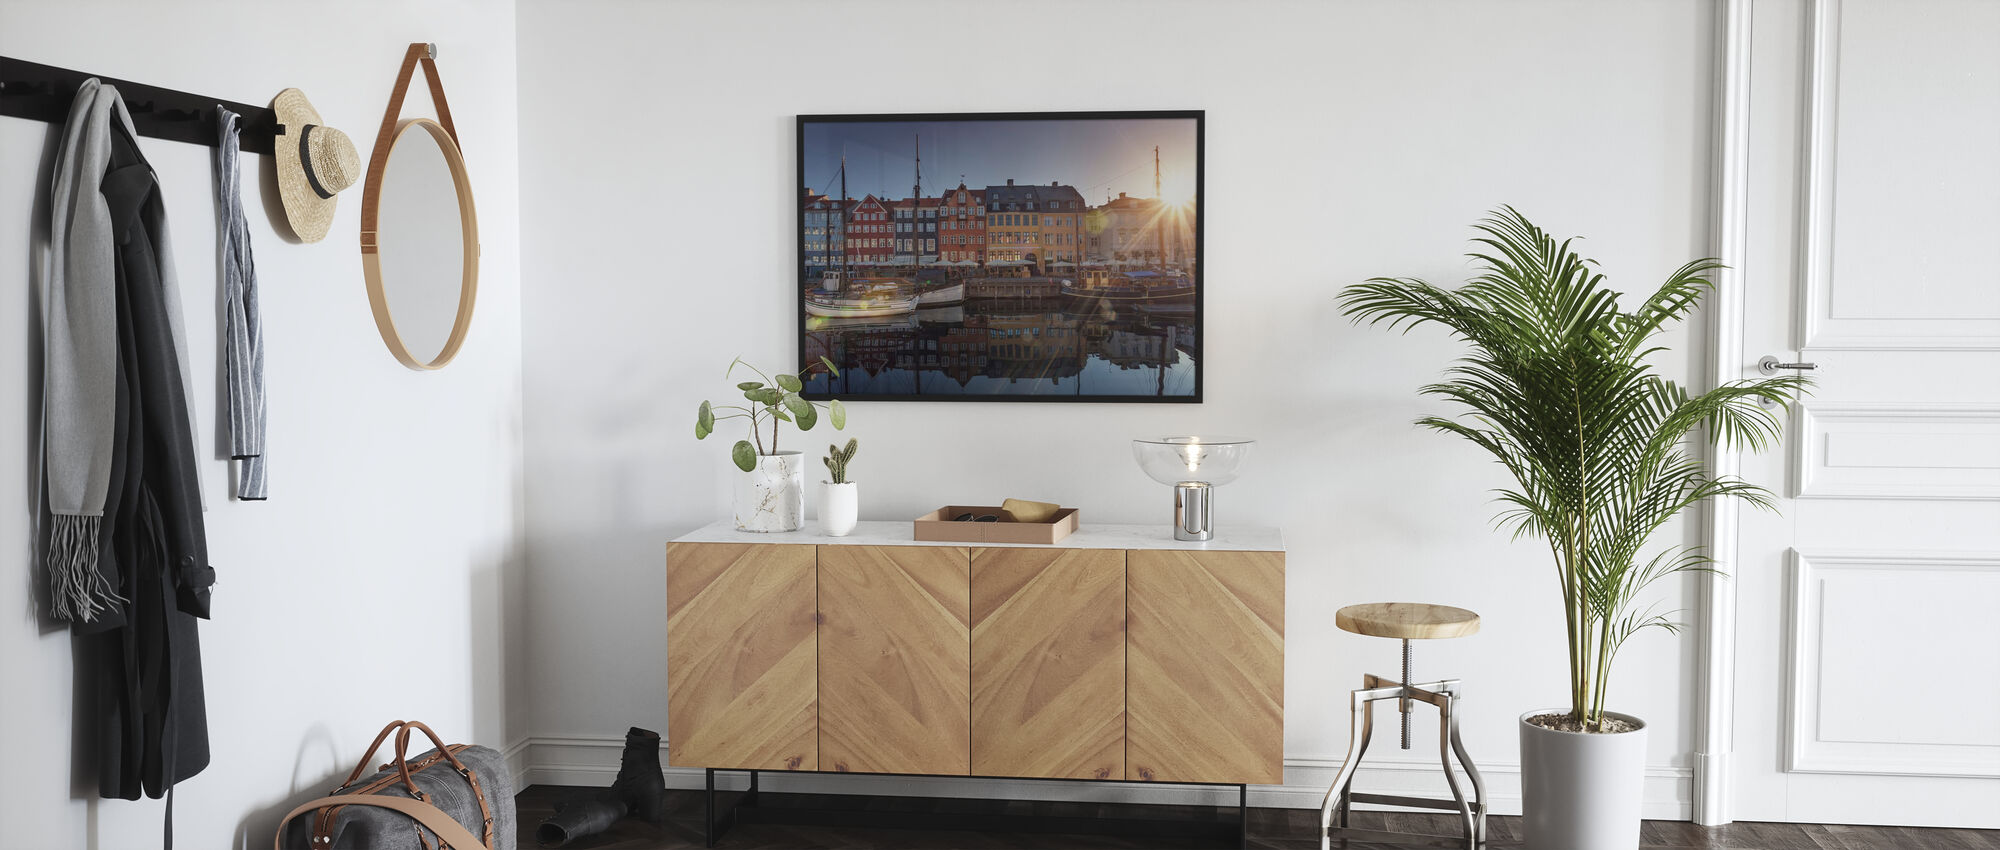 Solnedgang i Nyhavn, København, Danmark - Plakat - Gang